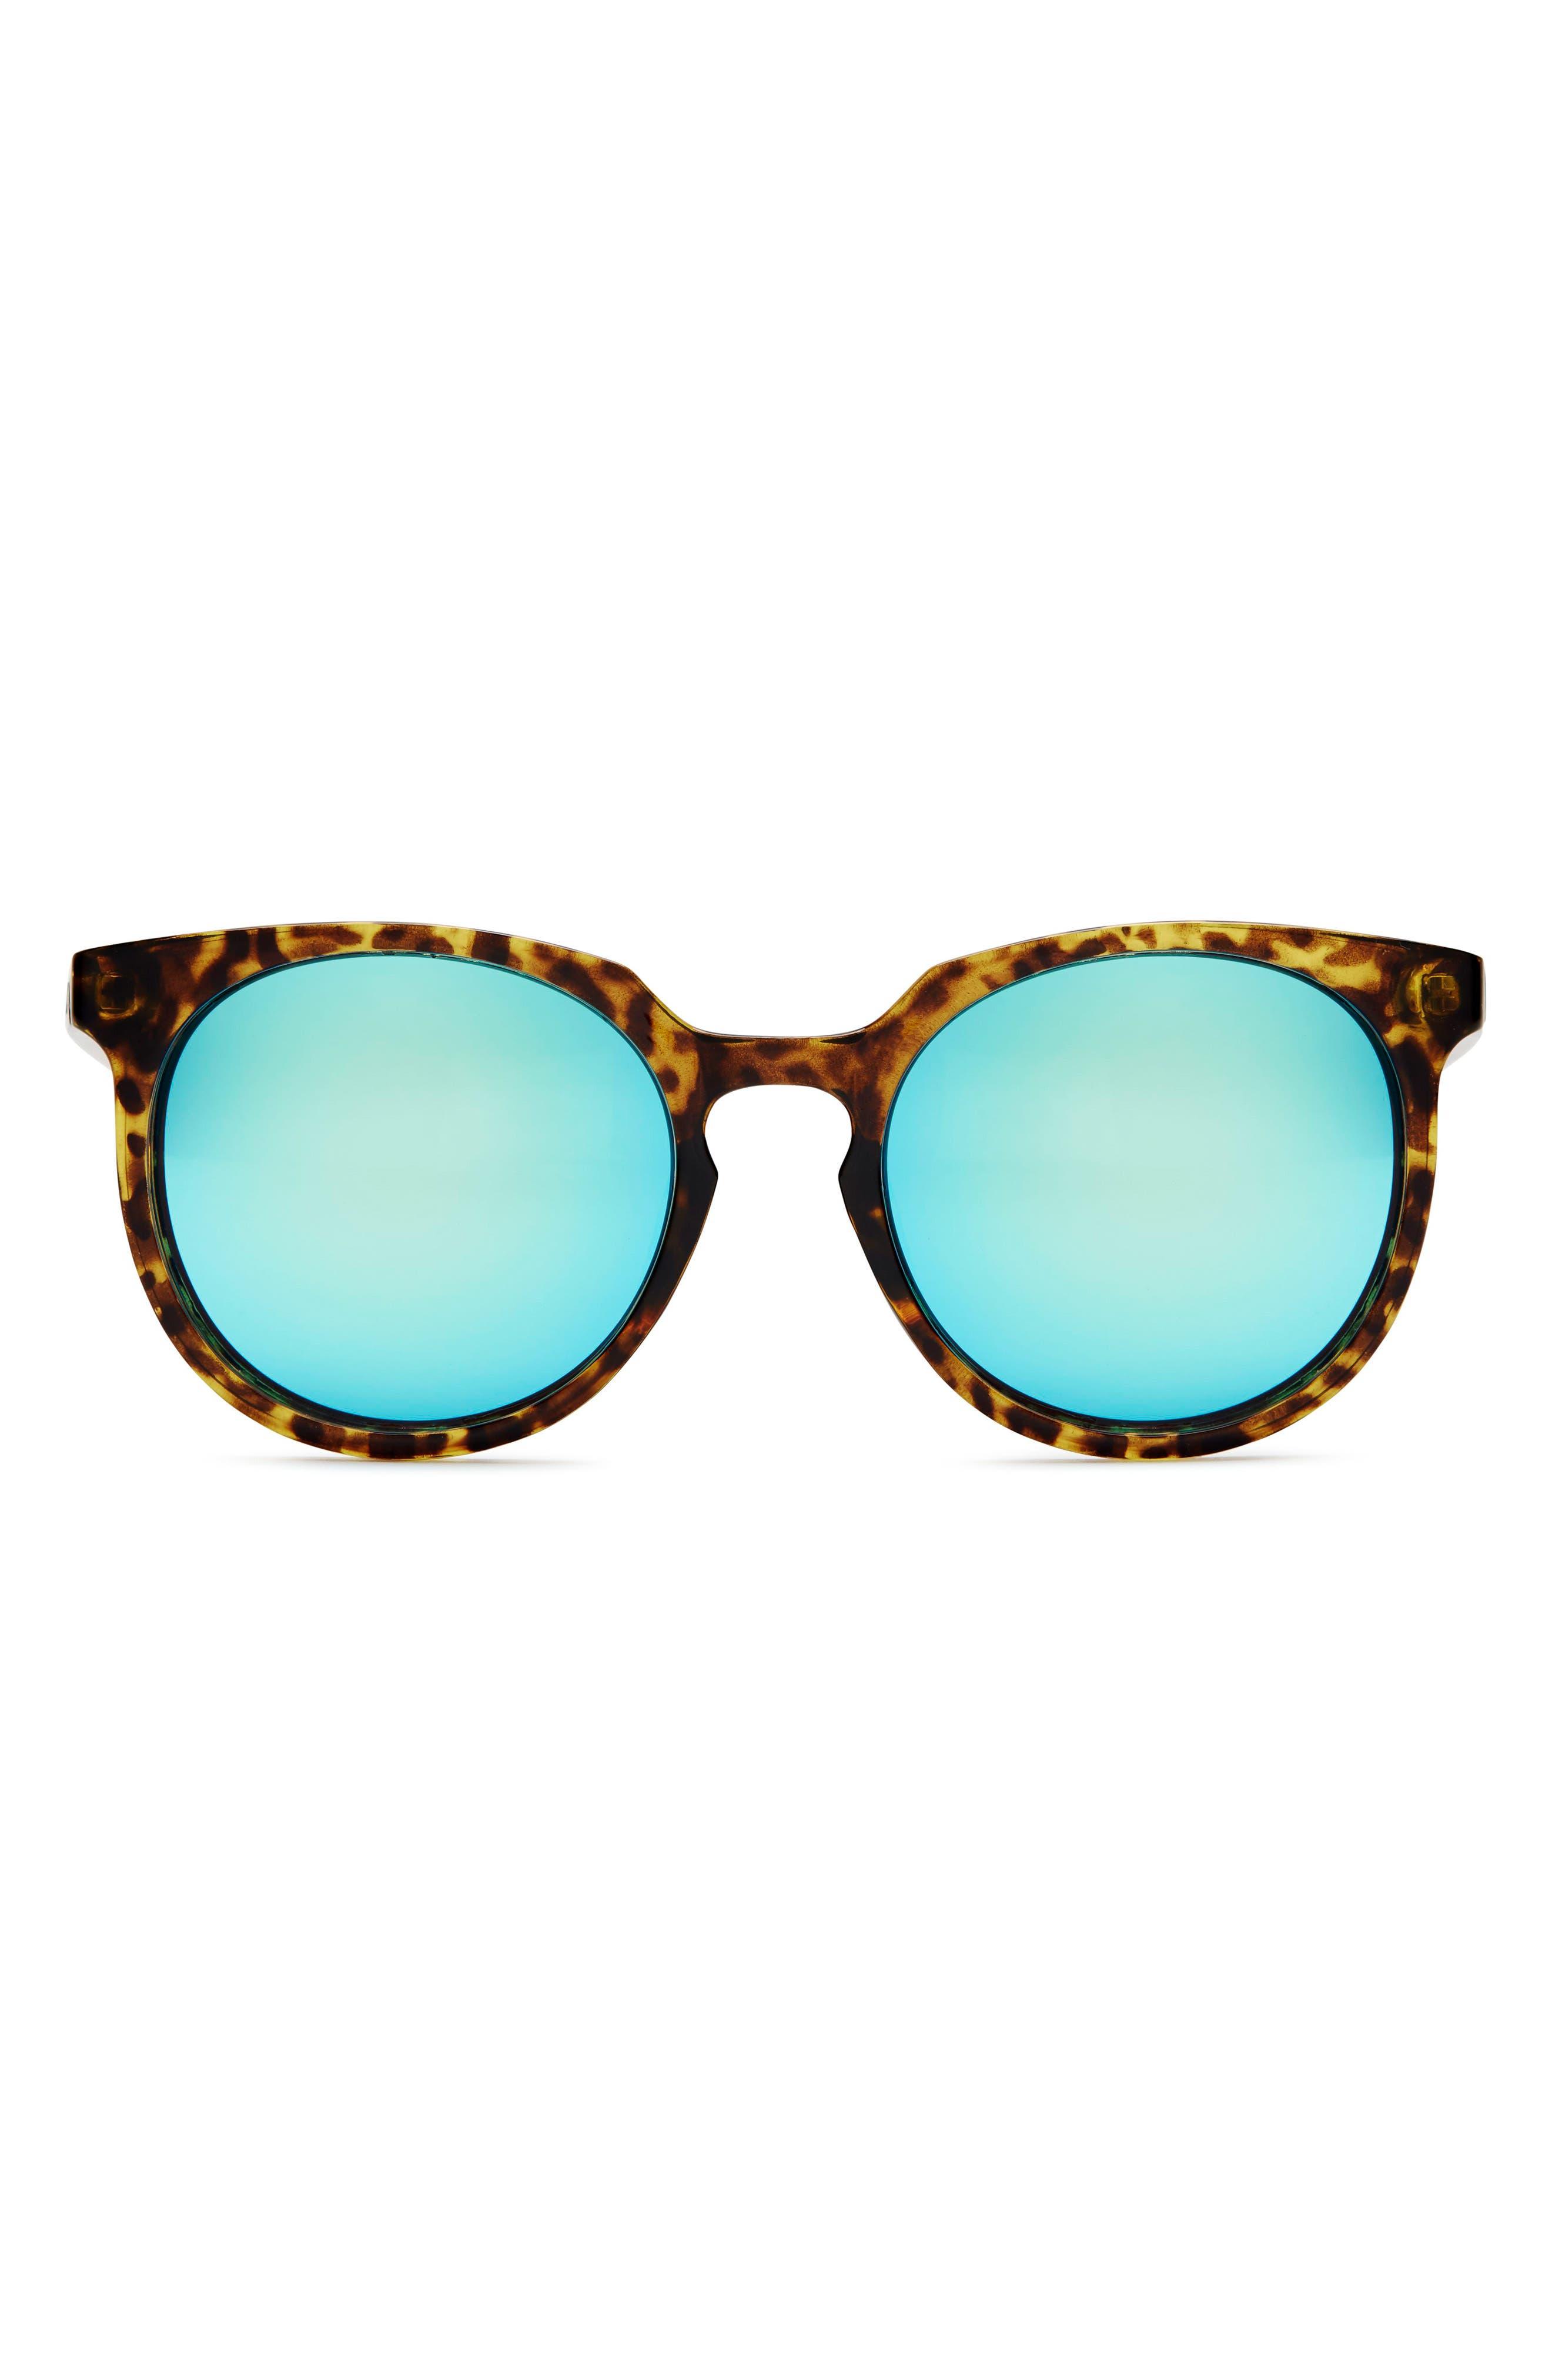 Don't Change 60mm Round Sunglasses, Main, color, 410